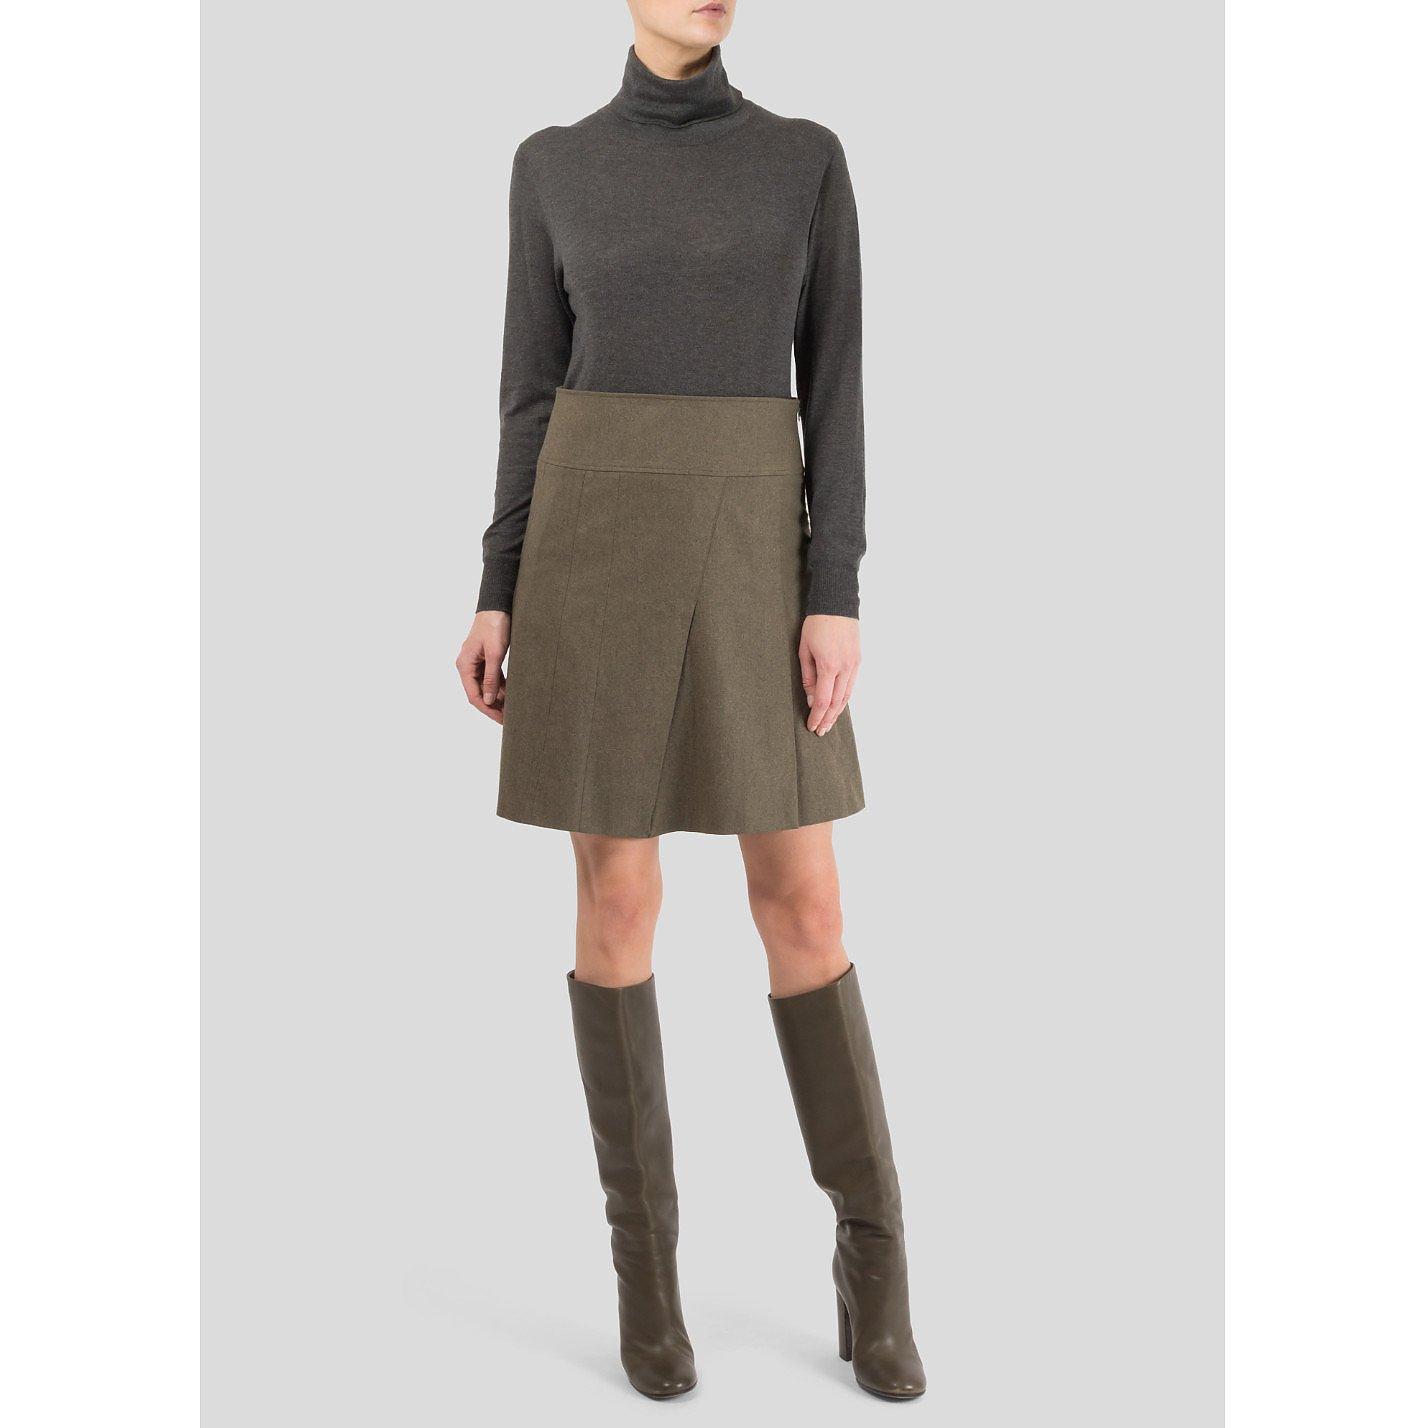 Burberry Pleated Wool Skirt